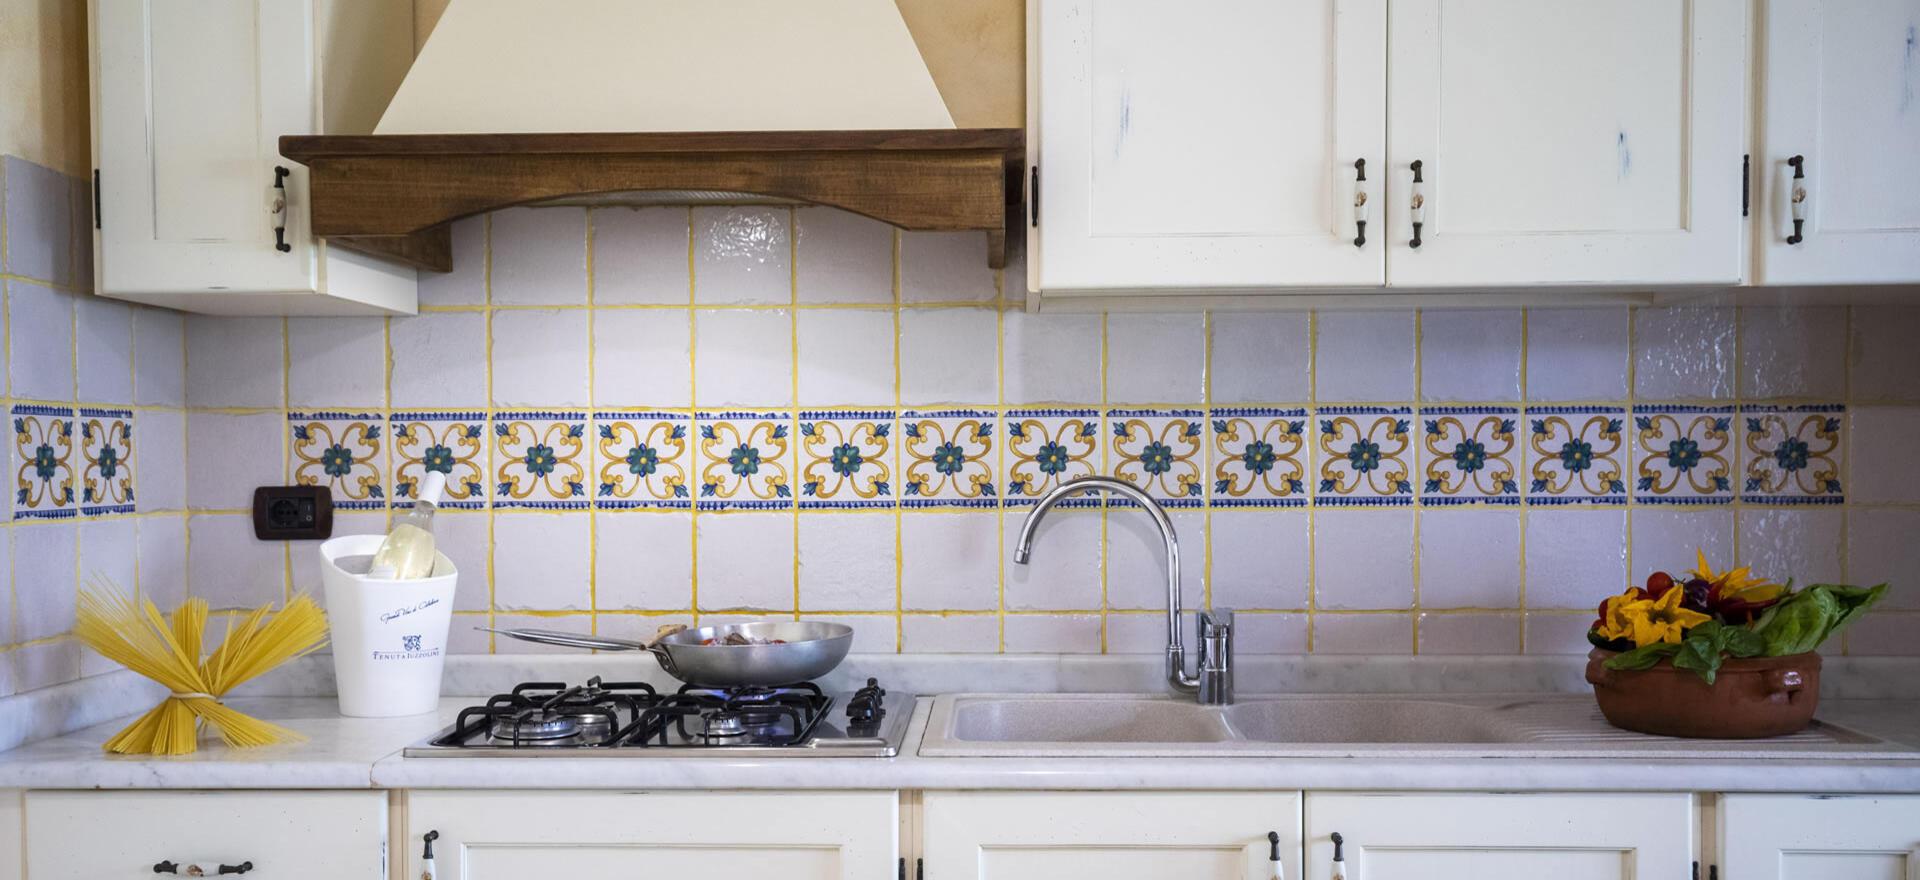 borgodonnacanfora fr appartements-trois-pieces 001